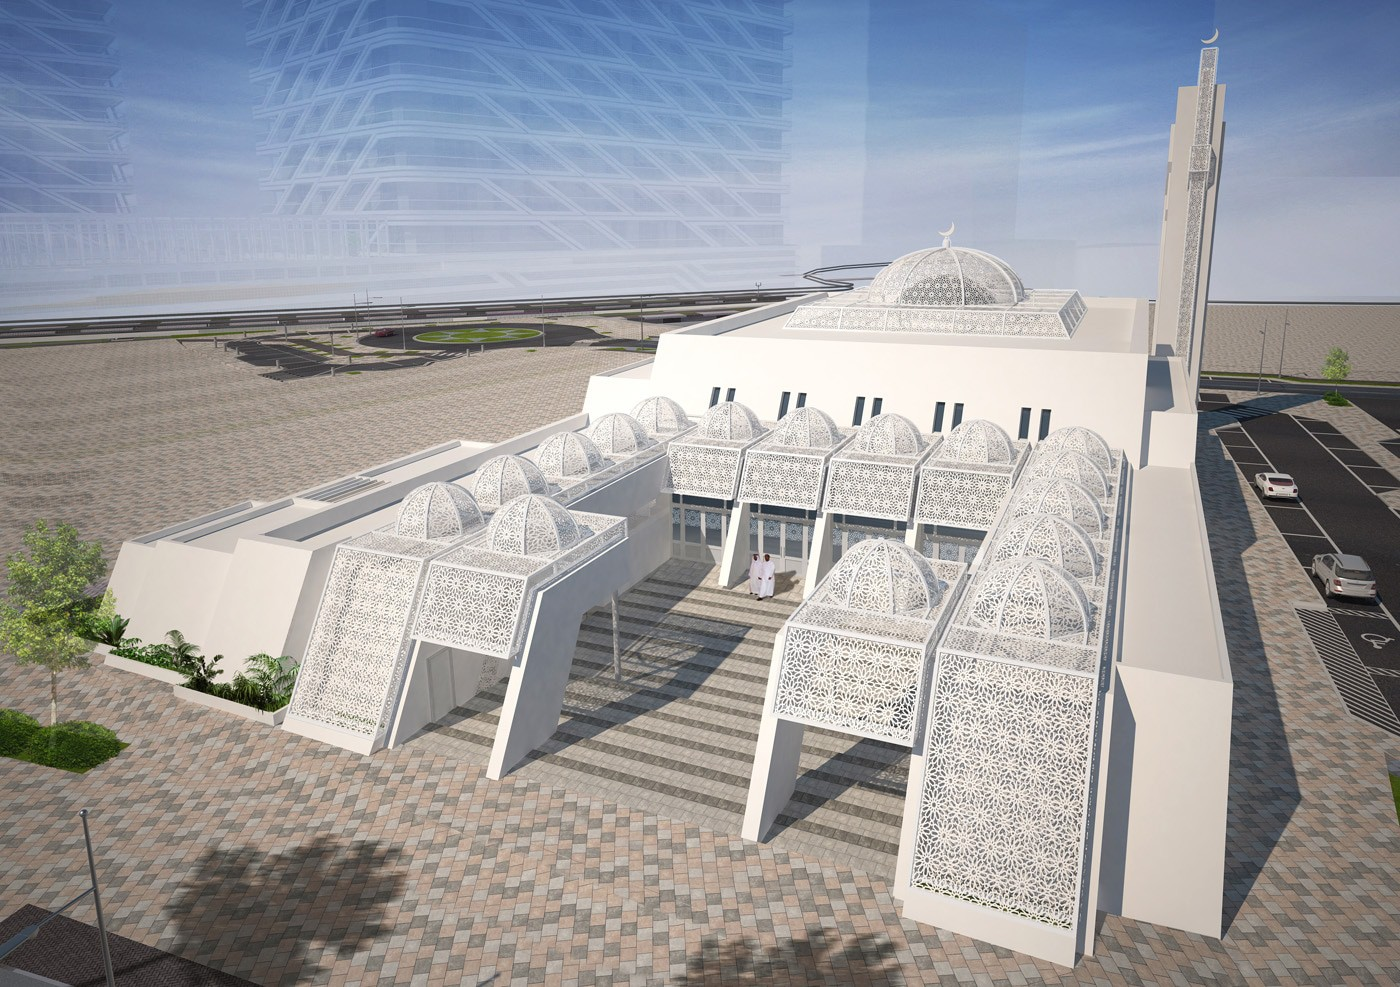 Architect: The Najmat Mosque Al Reem